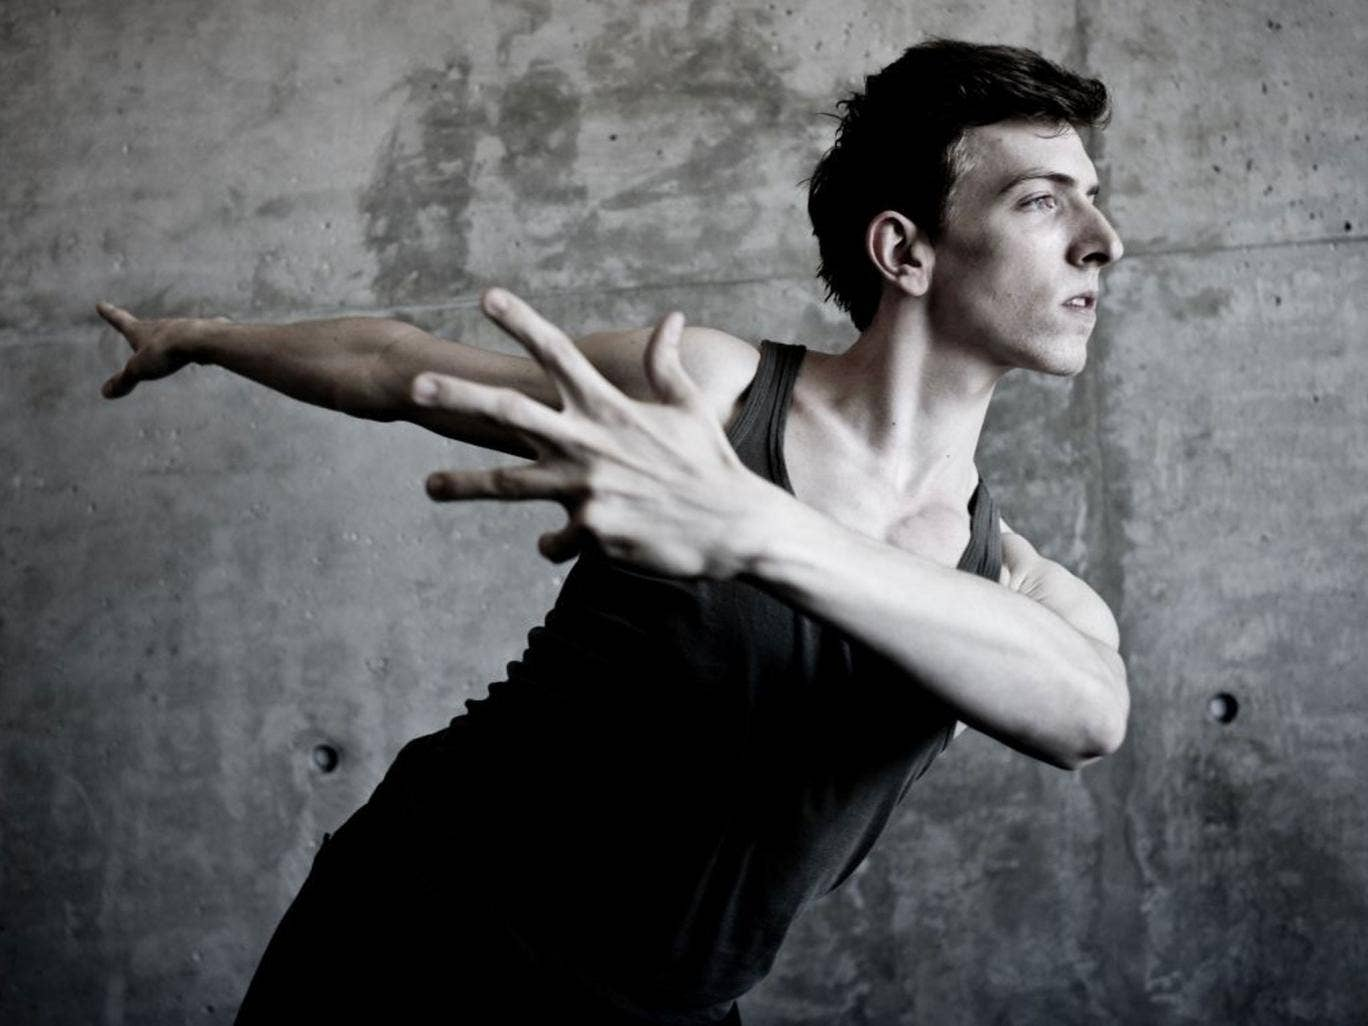 L.A. Dance Project at the Edinburgh Playhouse